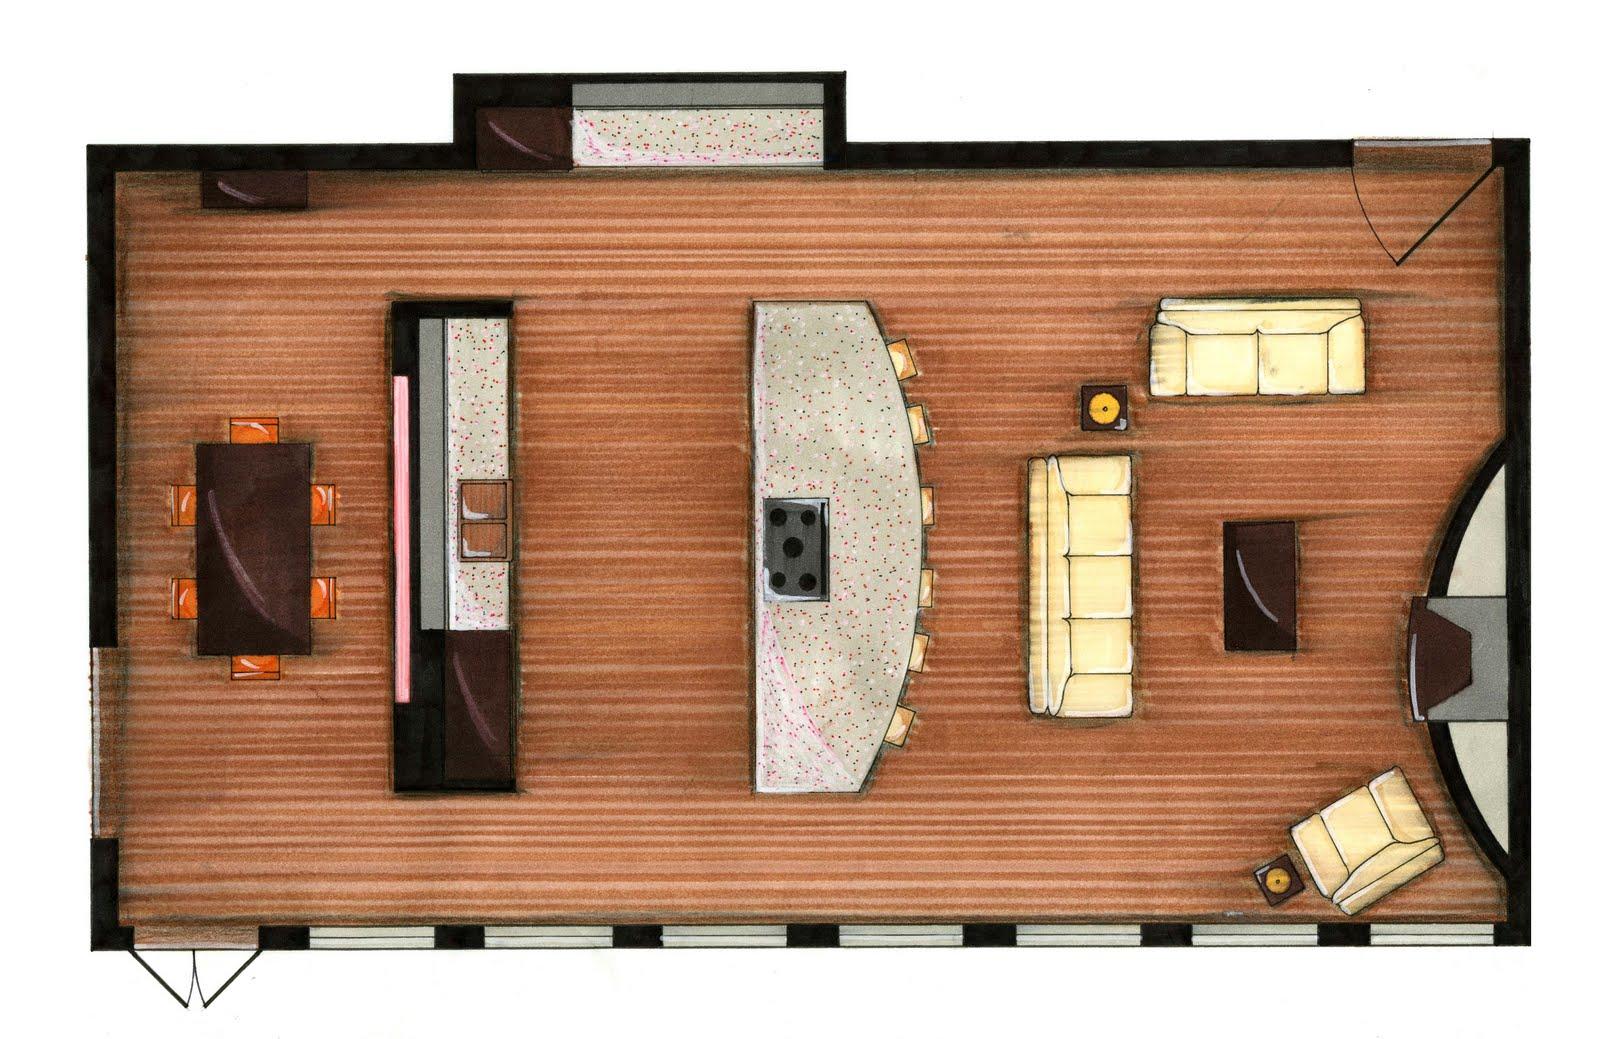 Greg hickman designs november 2009 for Rendered floor plan